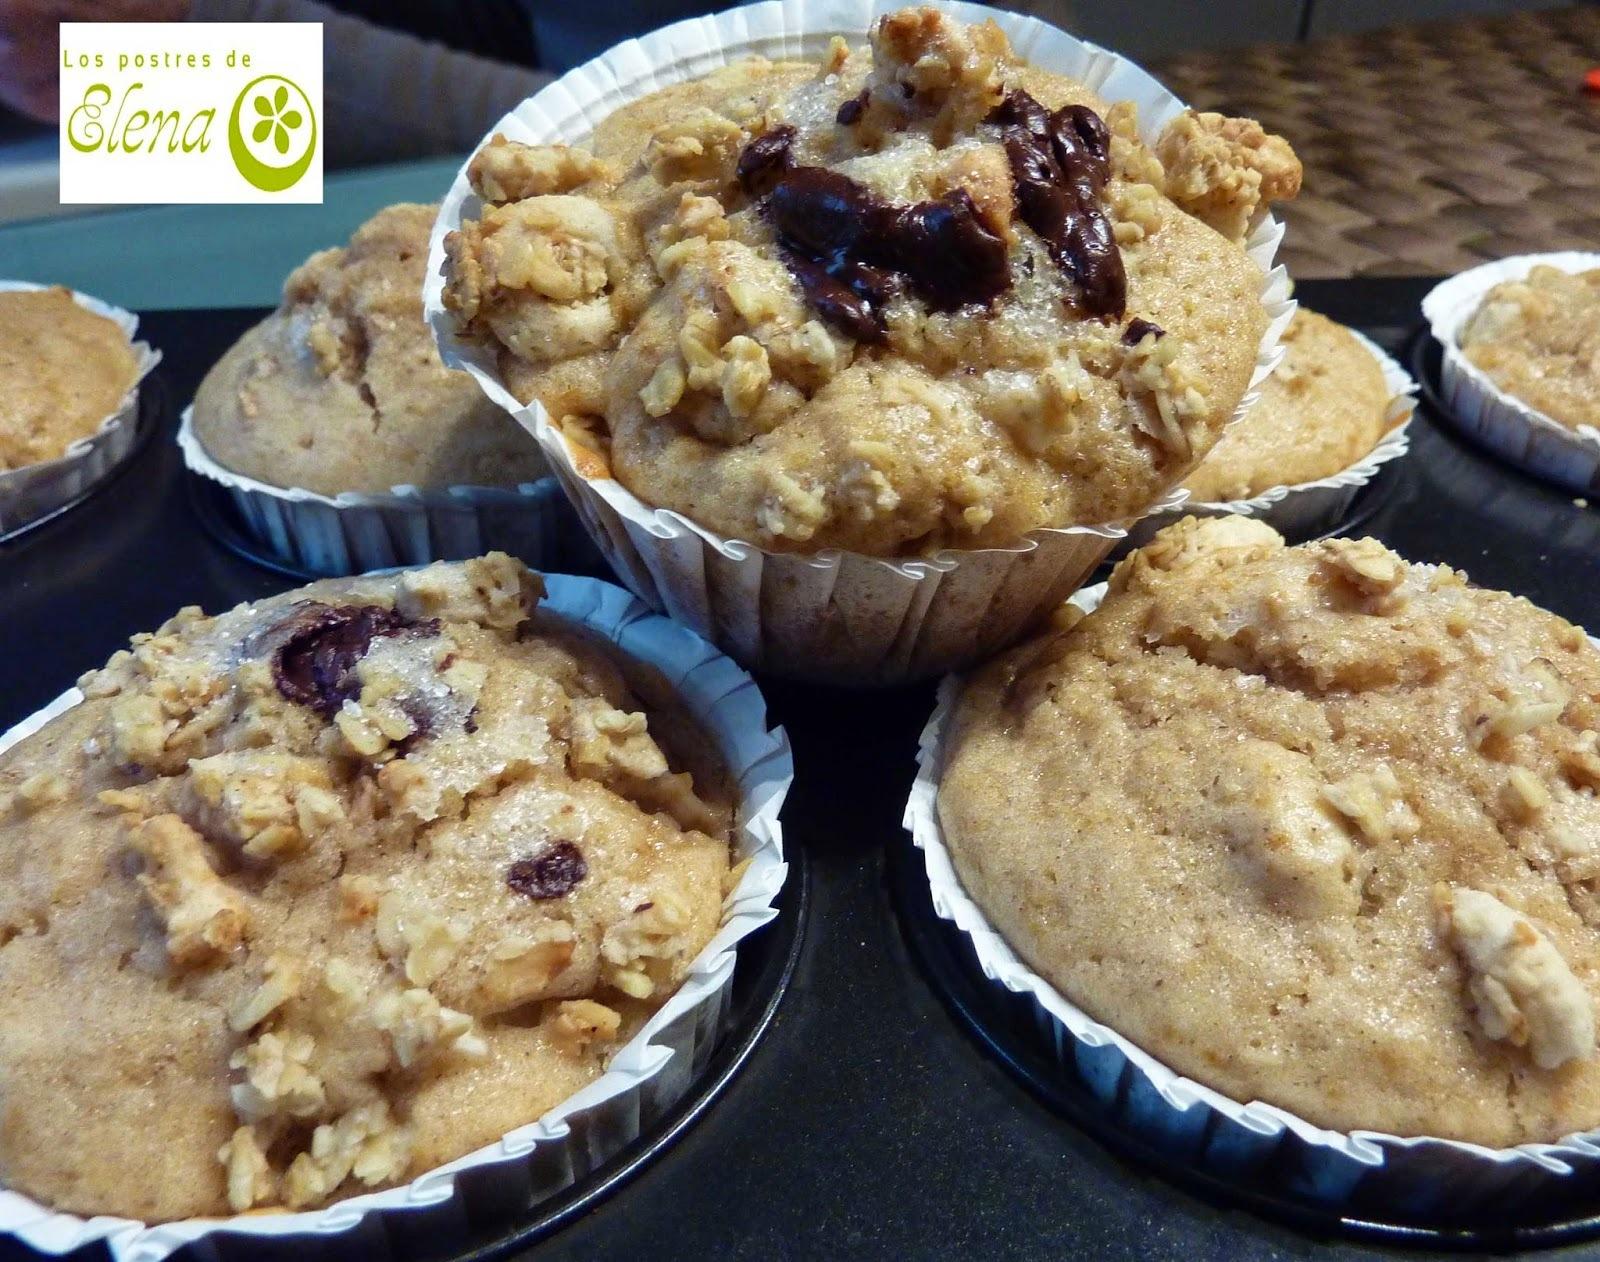 Muffins de pera y muesli crujiente